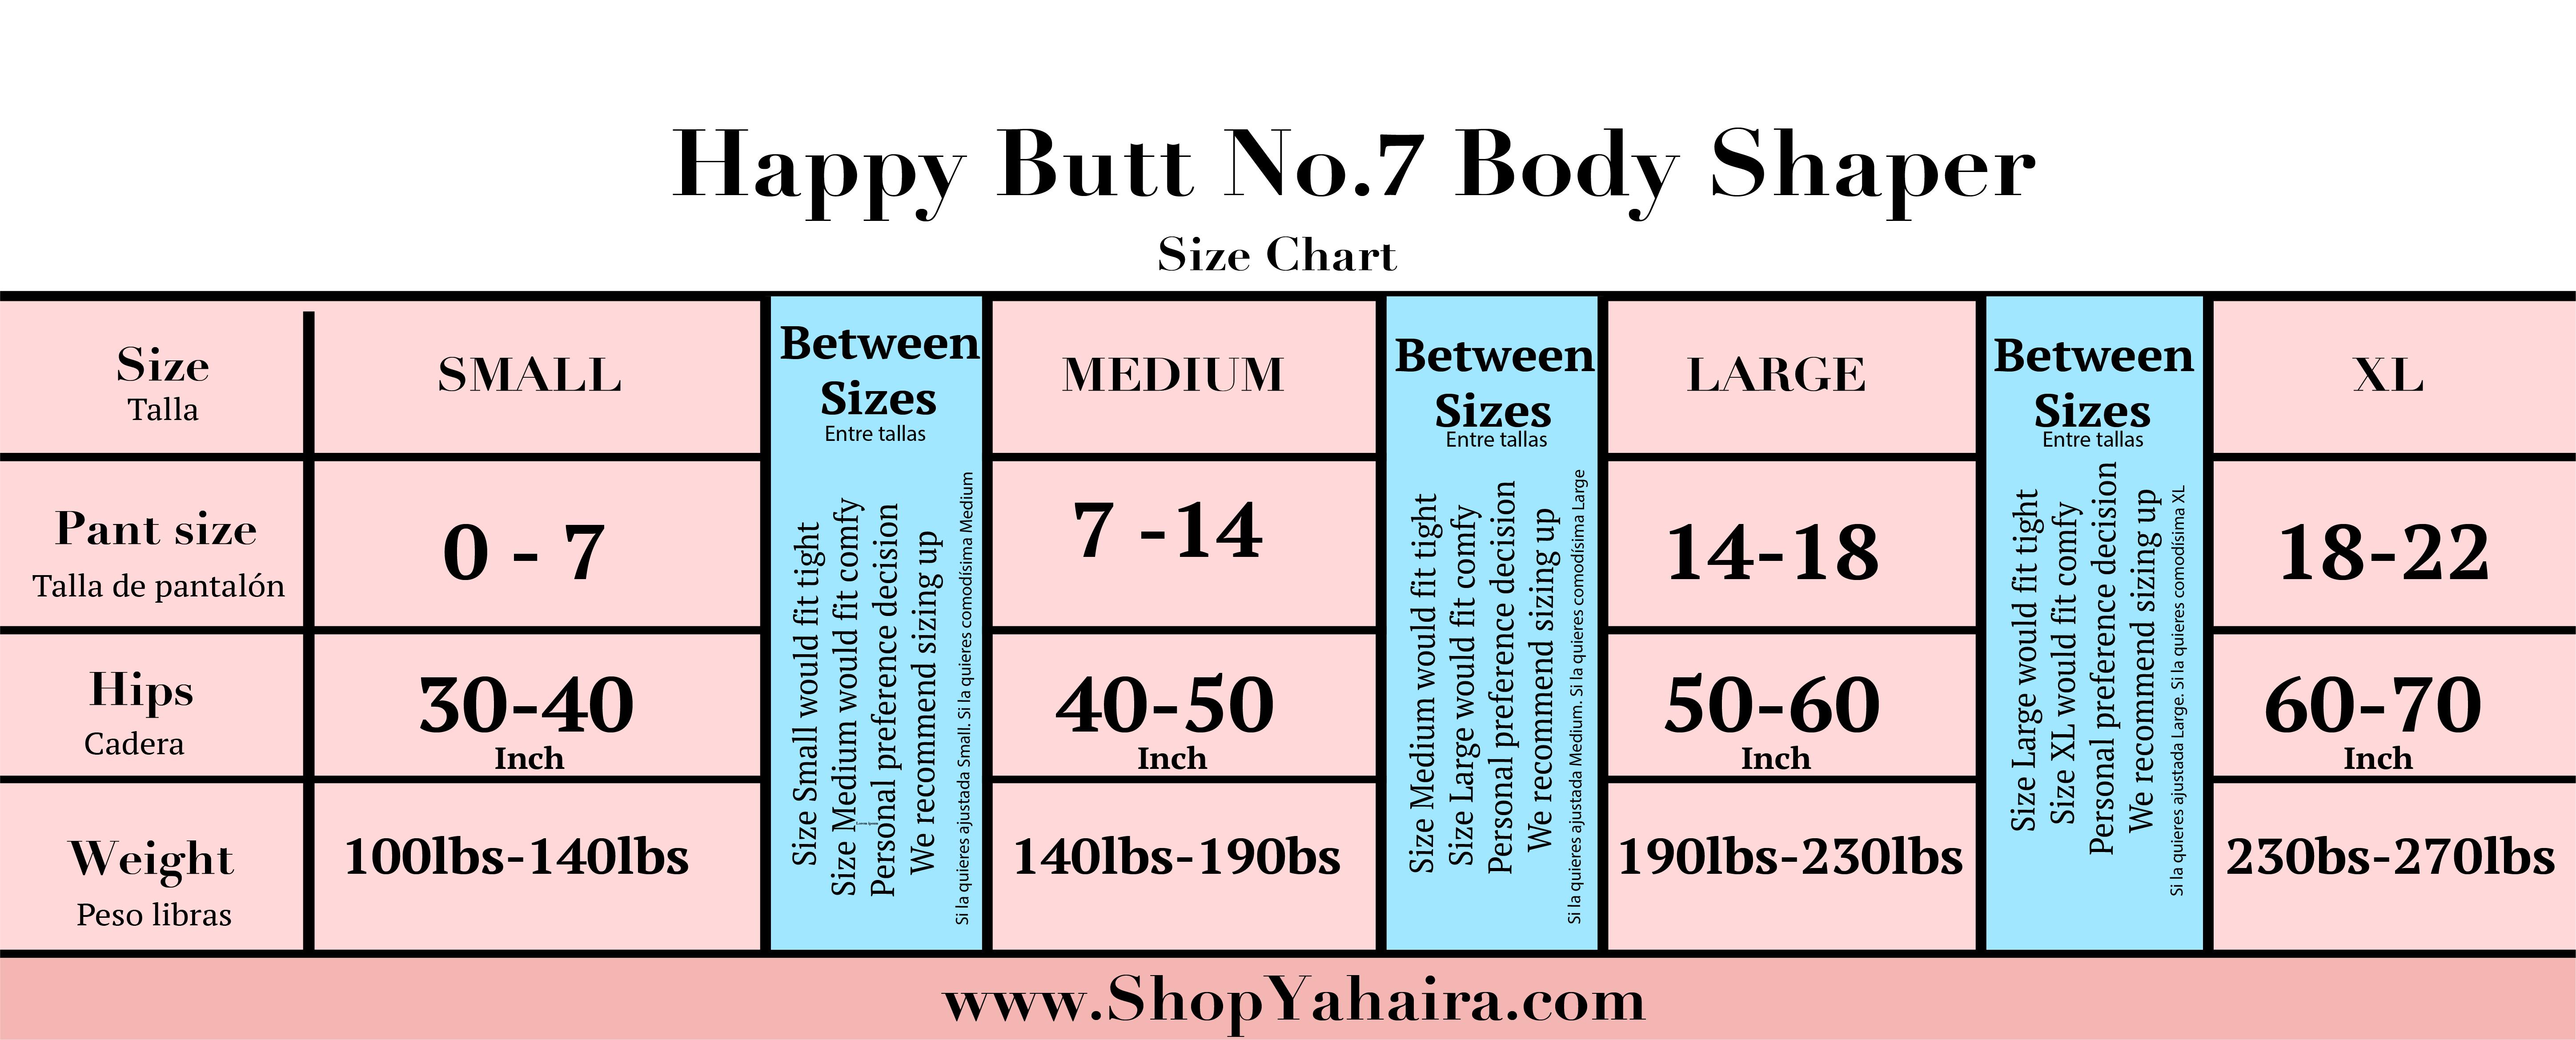 perfect-size-chart-hb-11-24-17.jpg